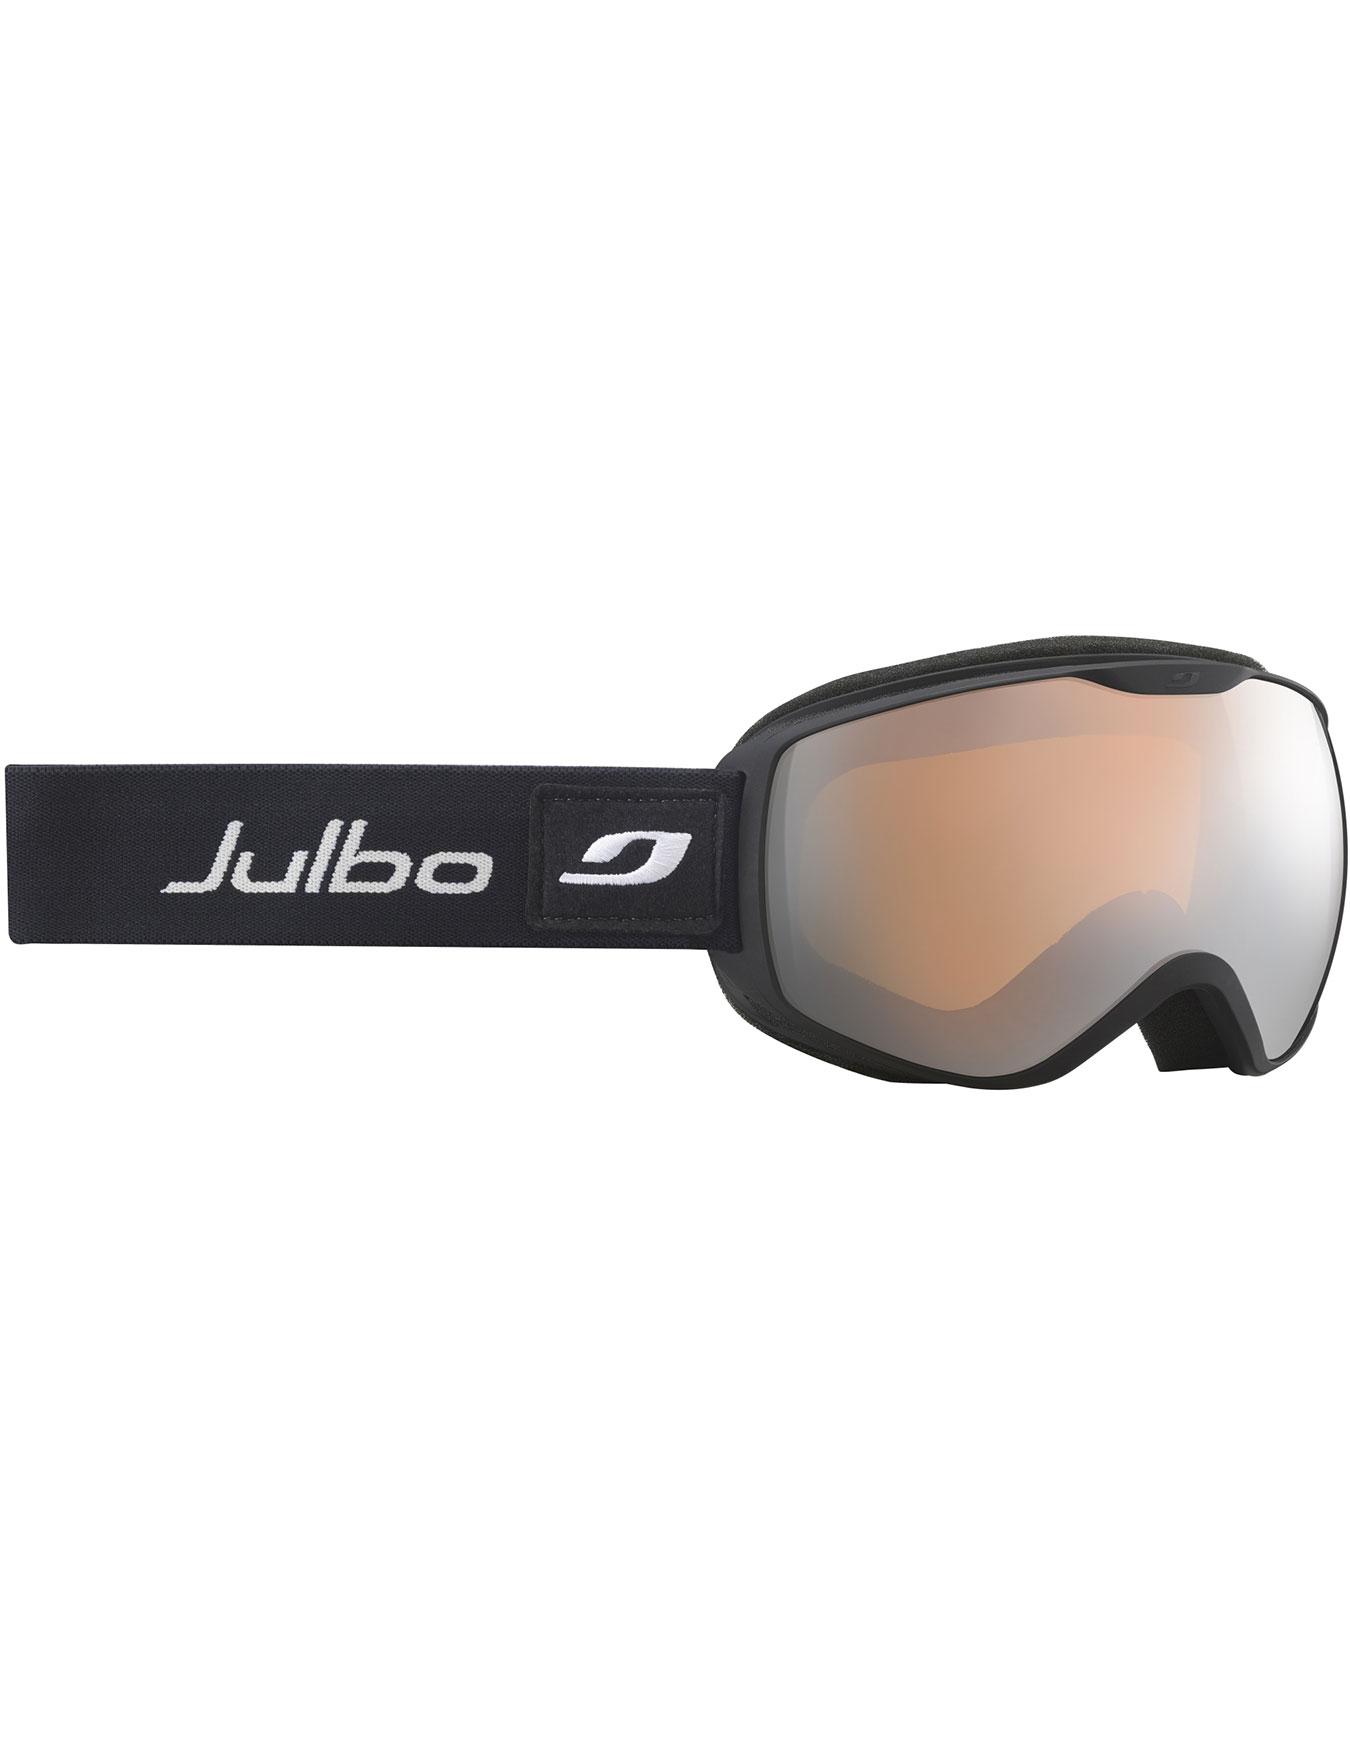 Masque de ski, masque de snowboard, masque oakley, masque Von Zipper    Snowleader 7da16b6b2806